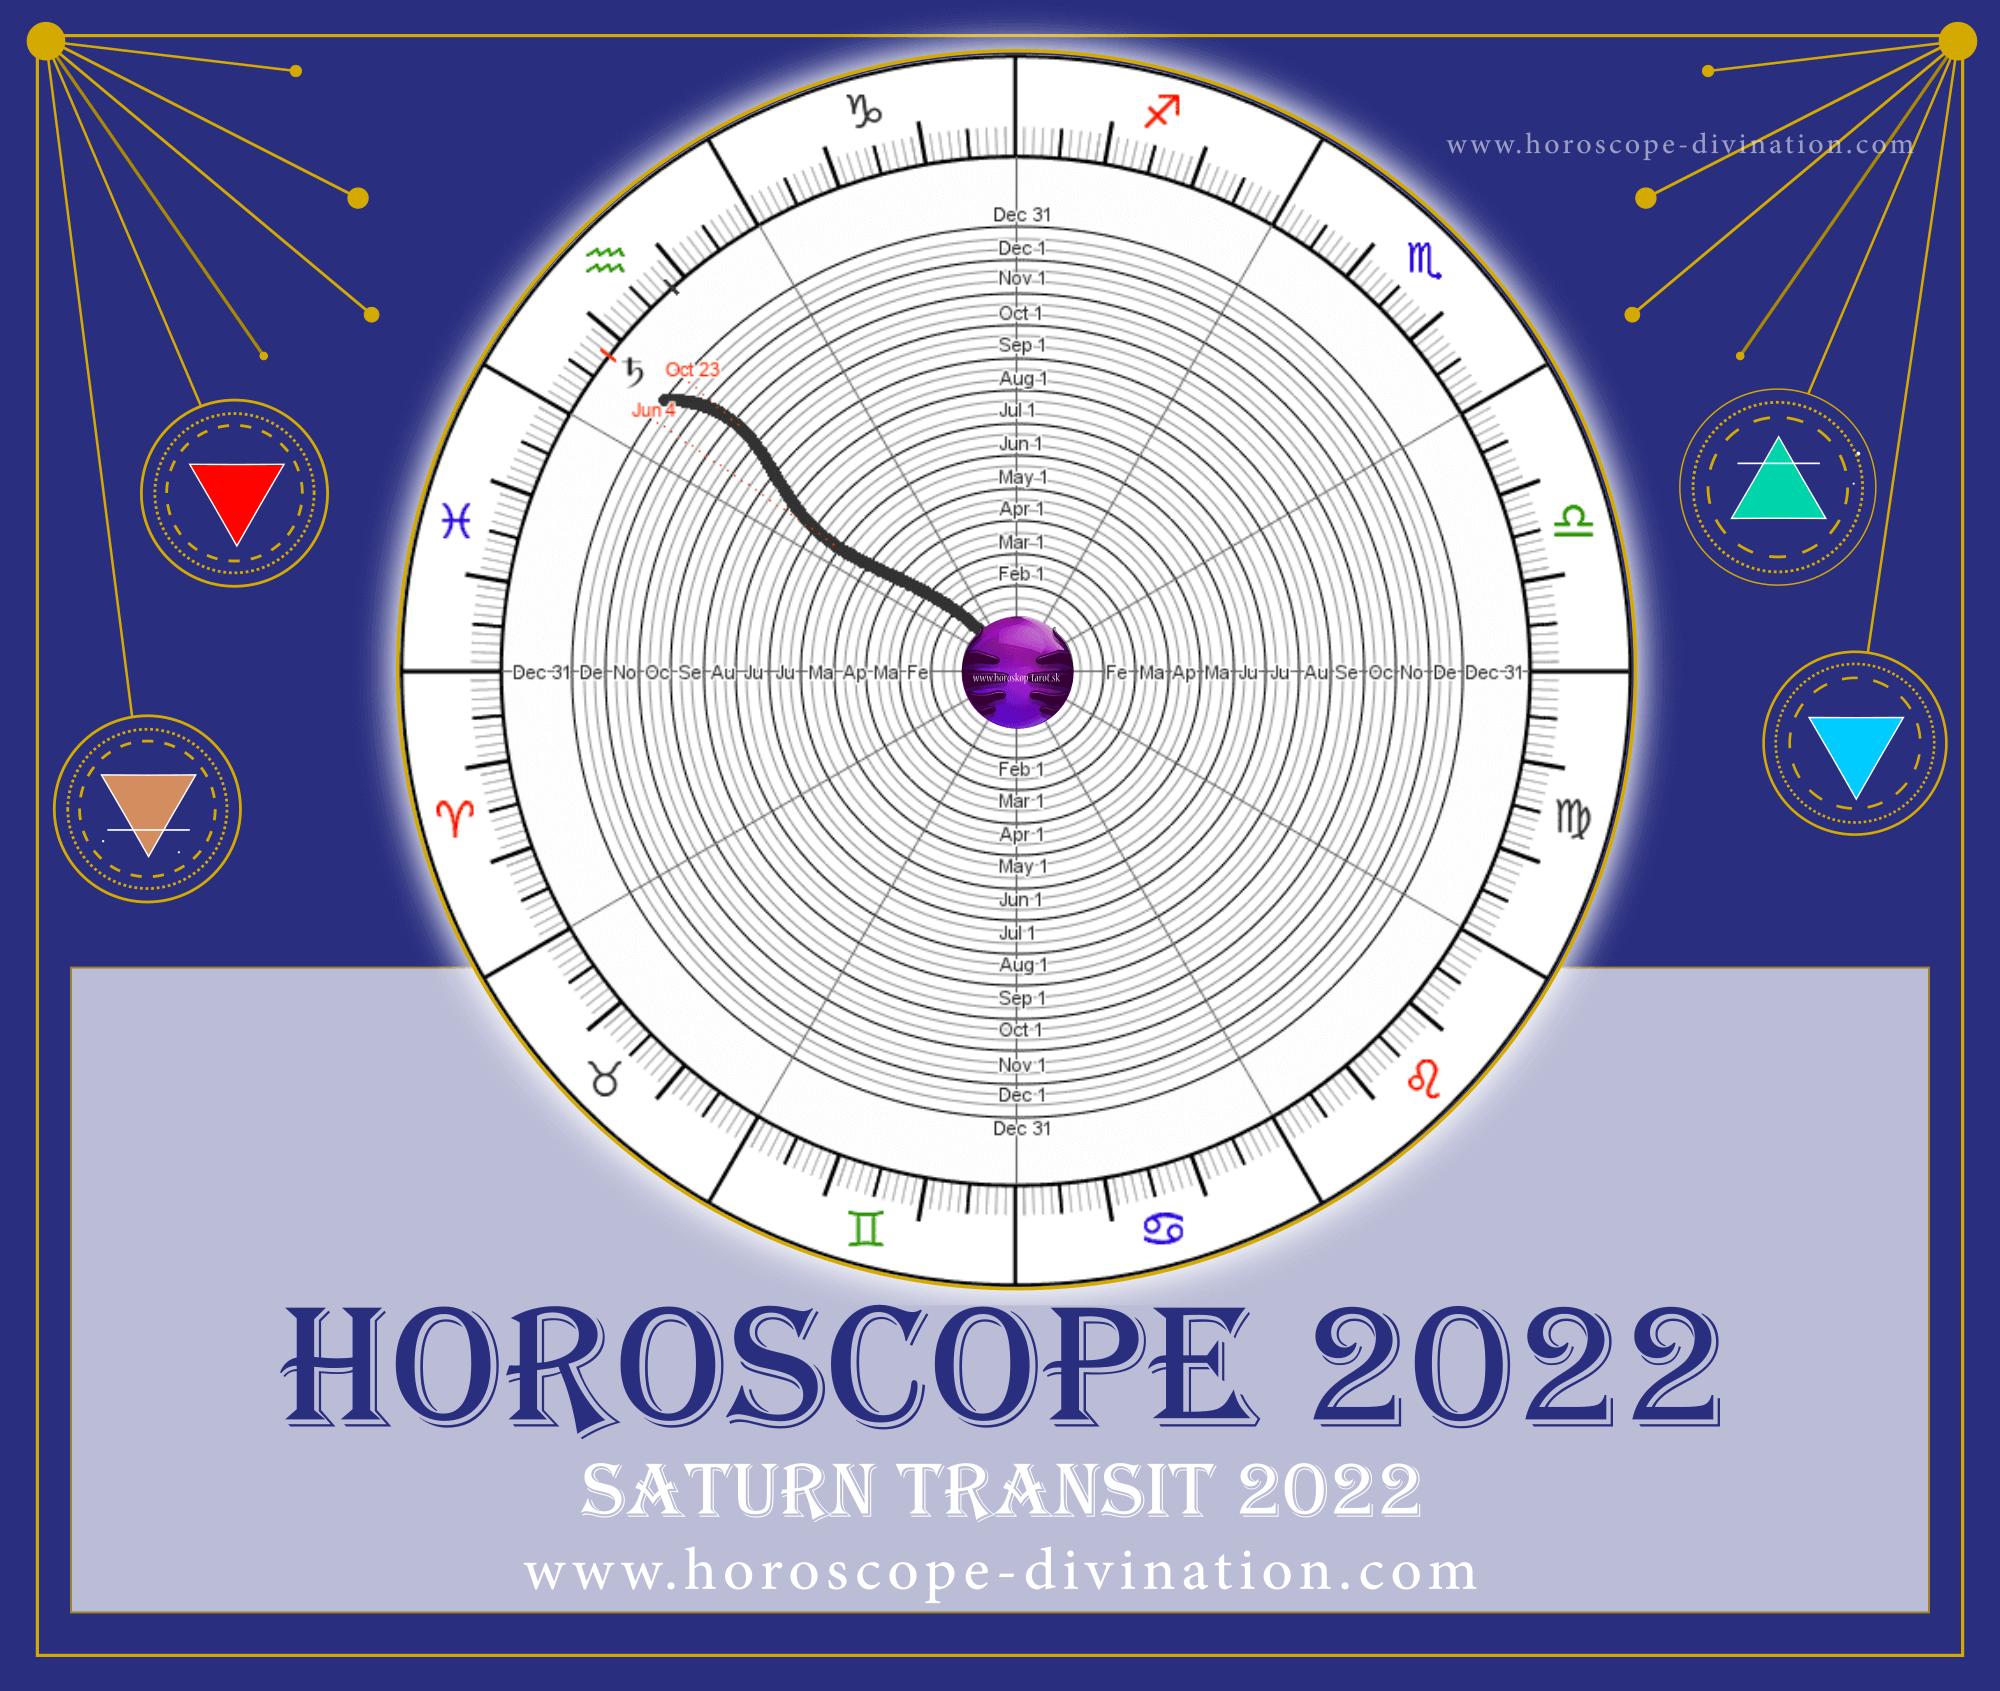 Astrology 20 — Retrograde Planets 20 Mercury, Venus, Mars...